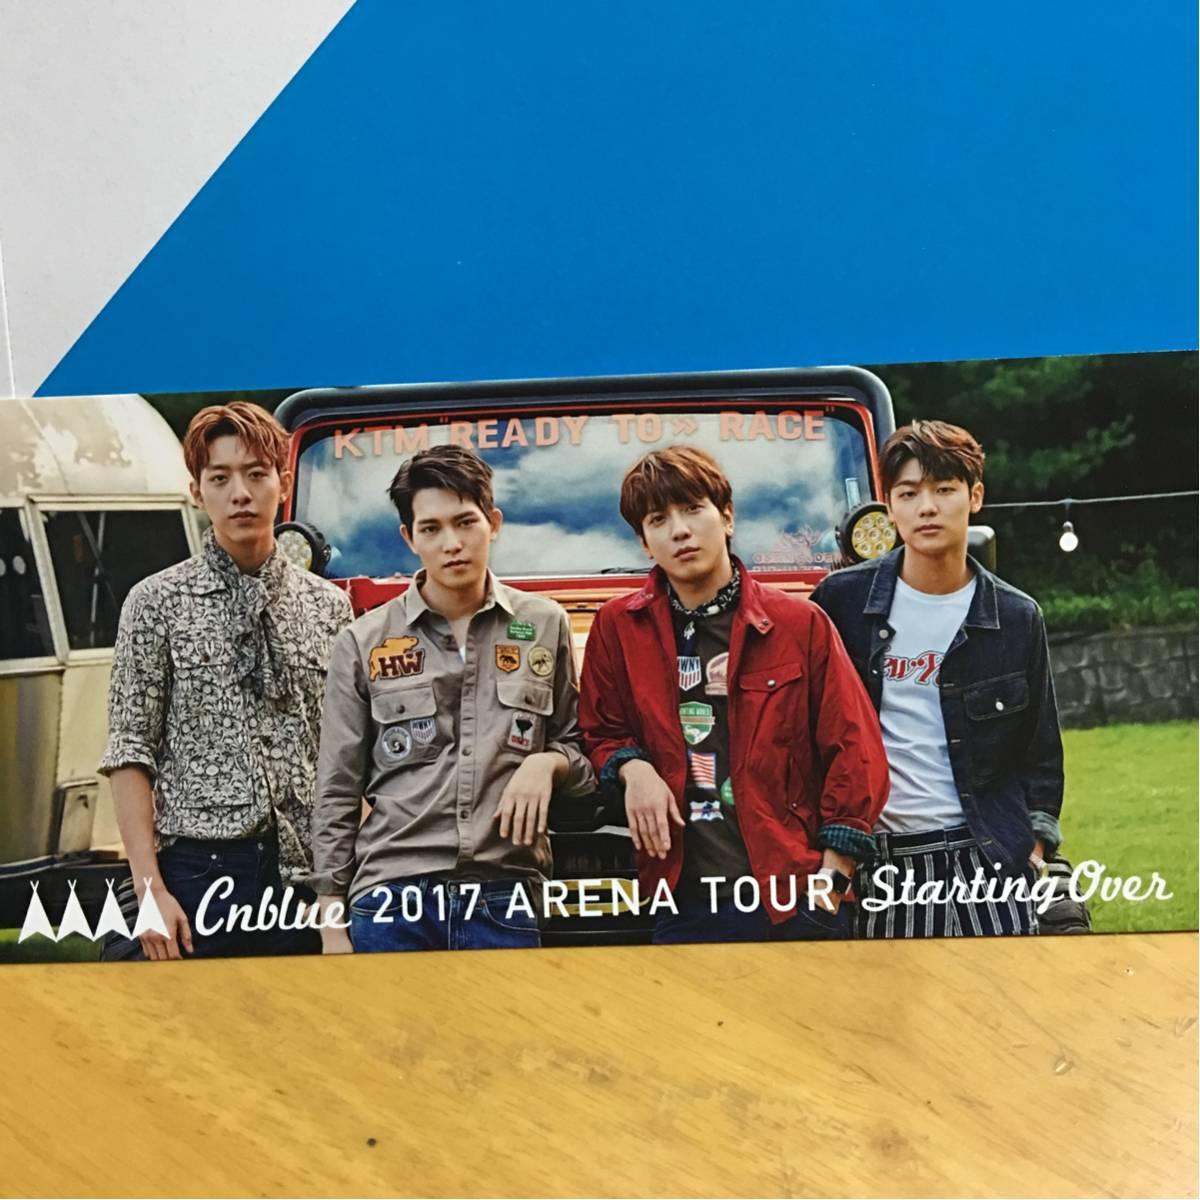 CNBLUE 2017Arena TOUR StartingOver チケット ライブグッズの画像